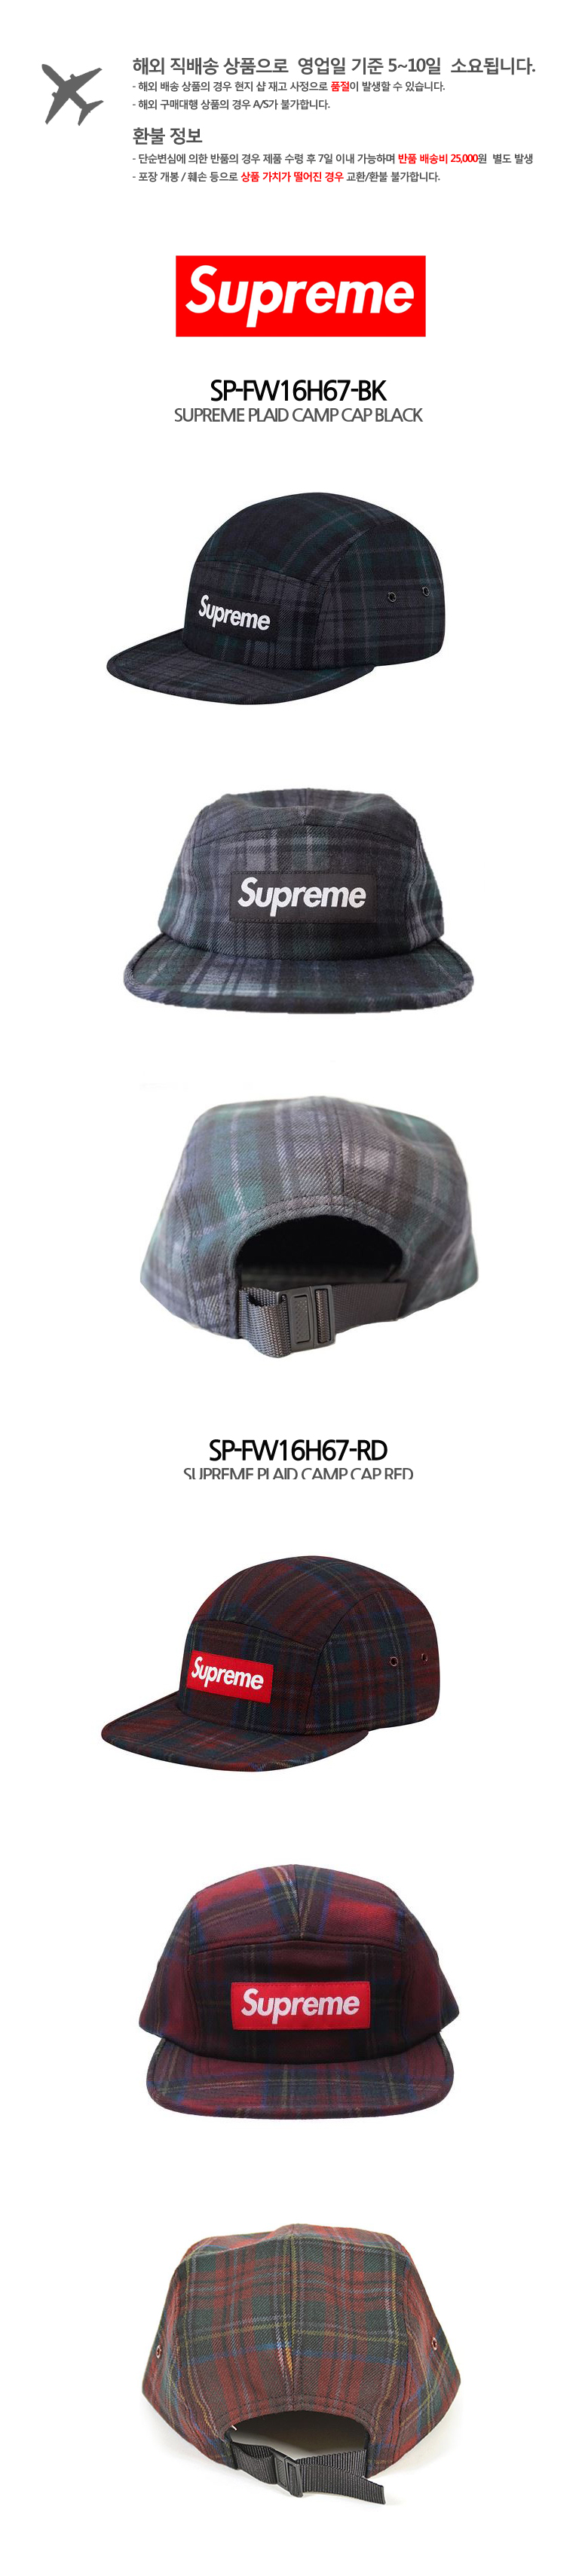 SUPREME CAMP CAP.jpg